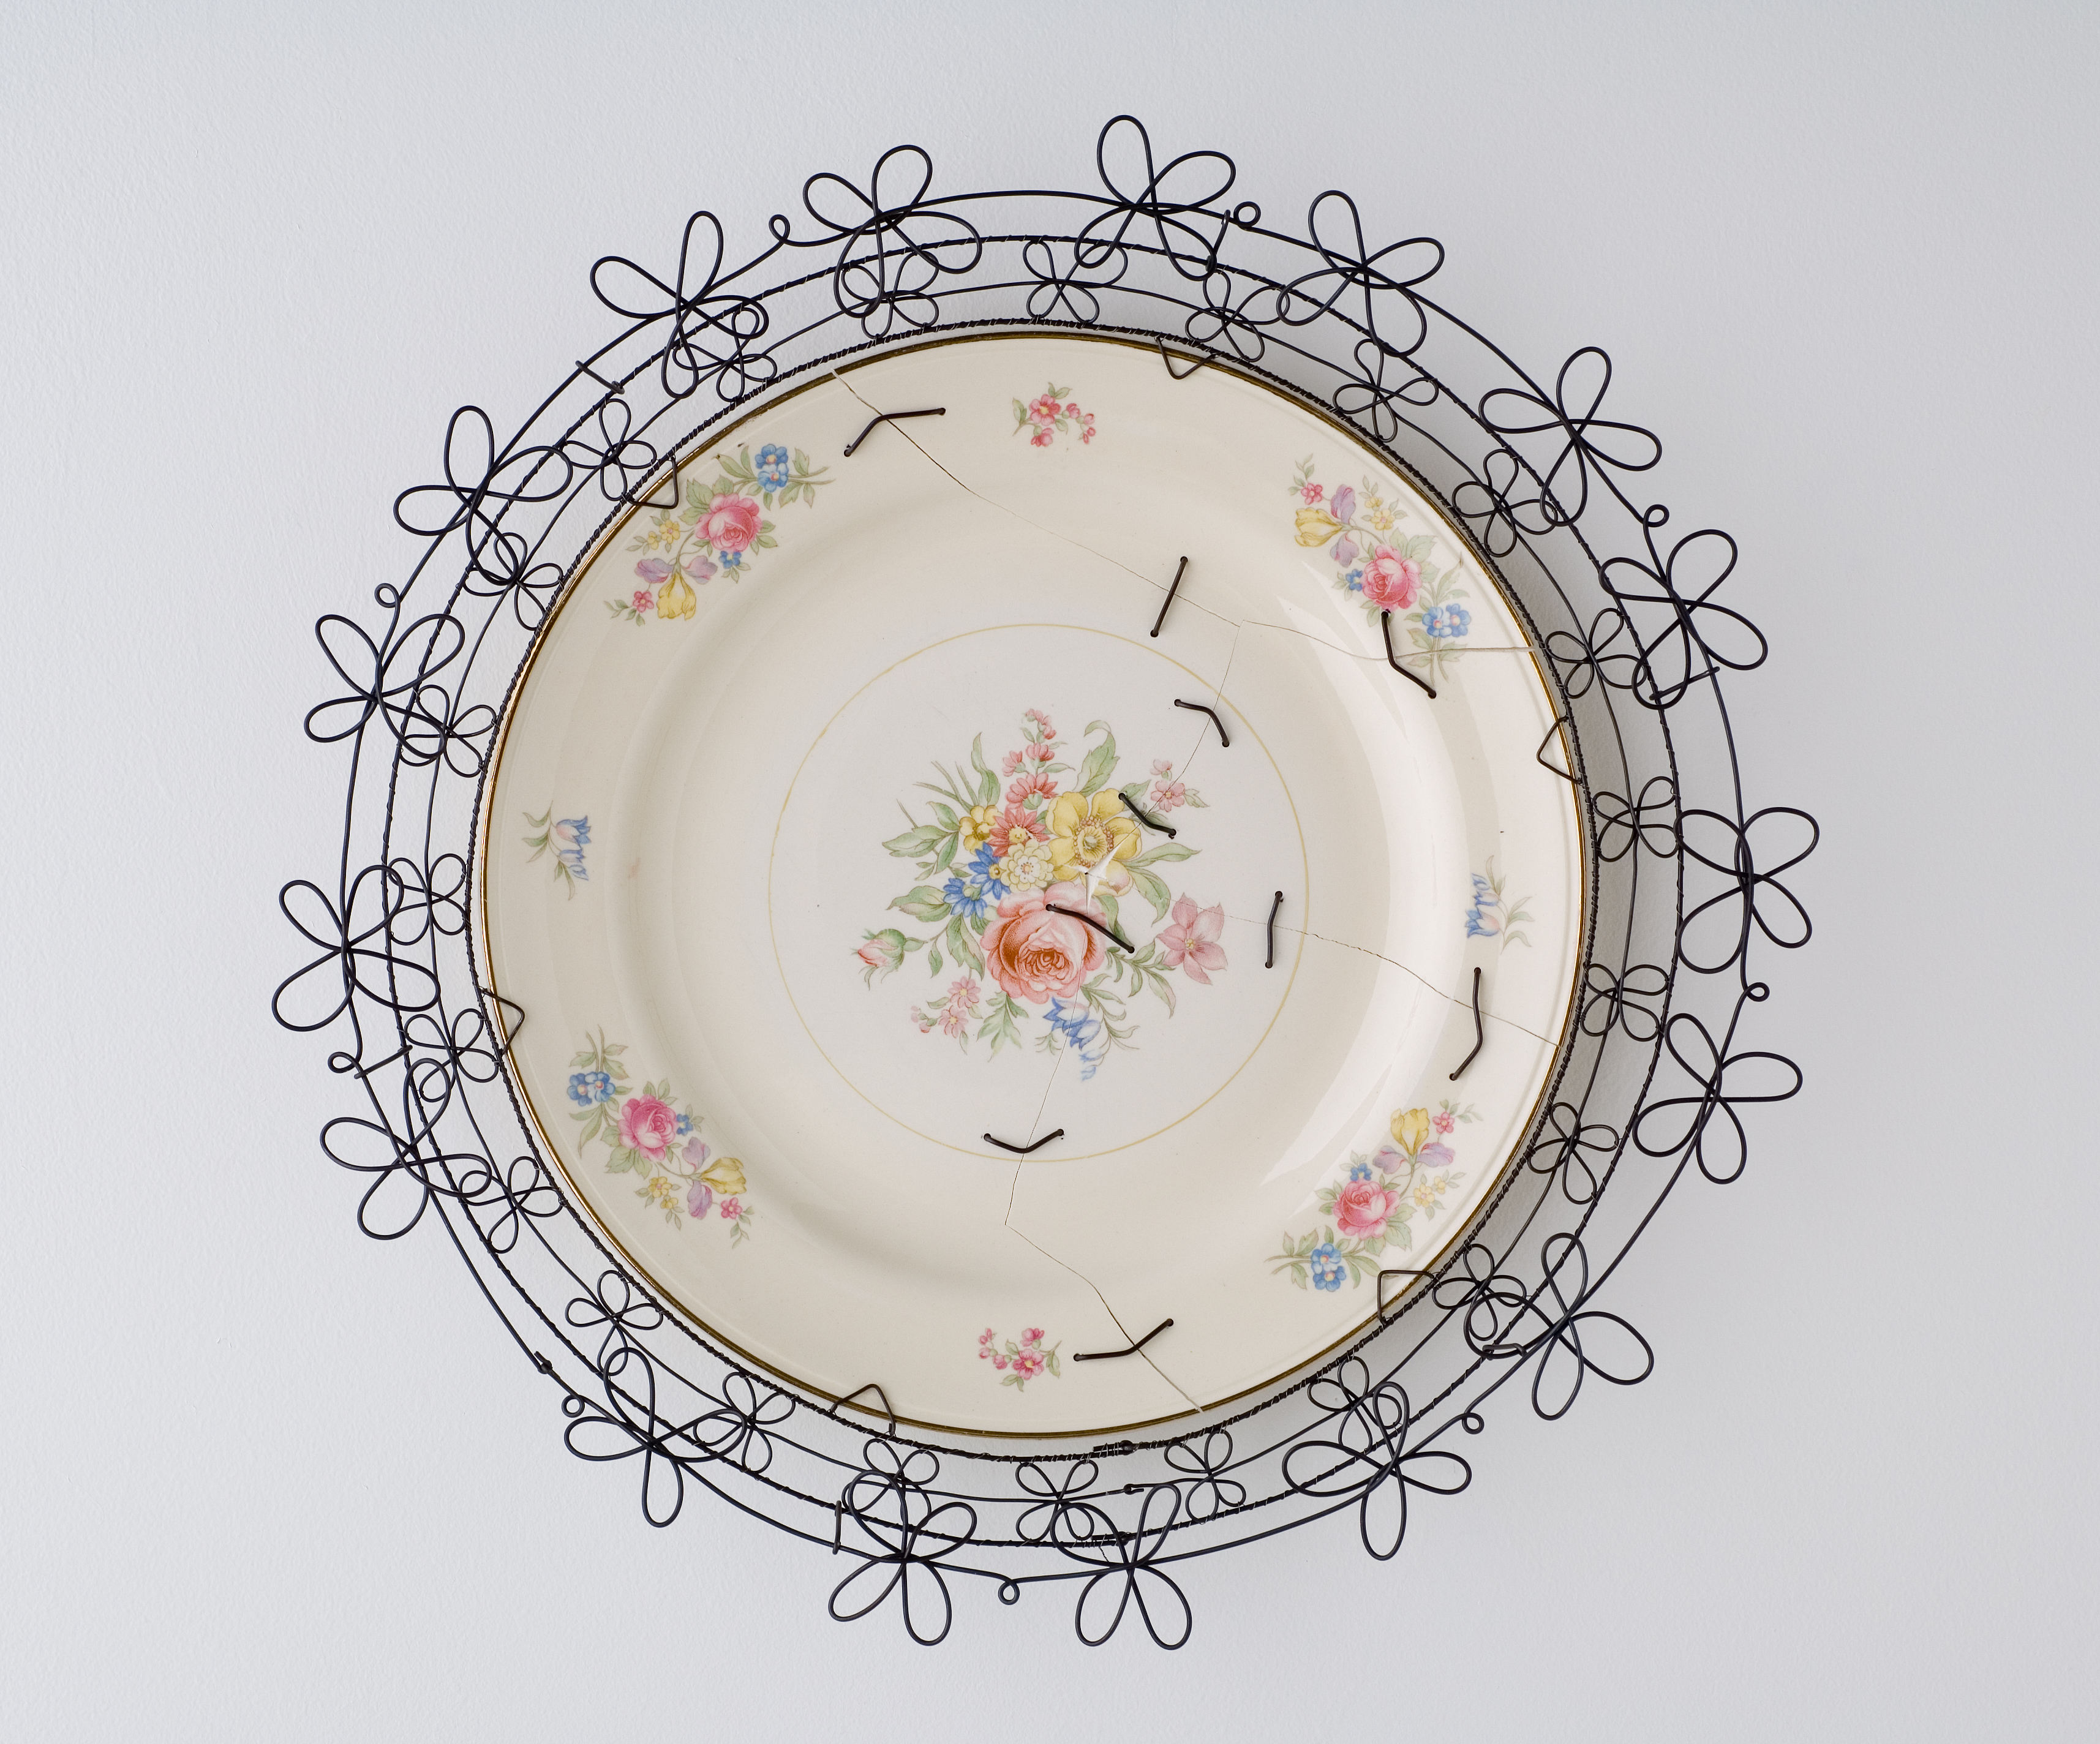 Rehabilitation Plate - Floral II